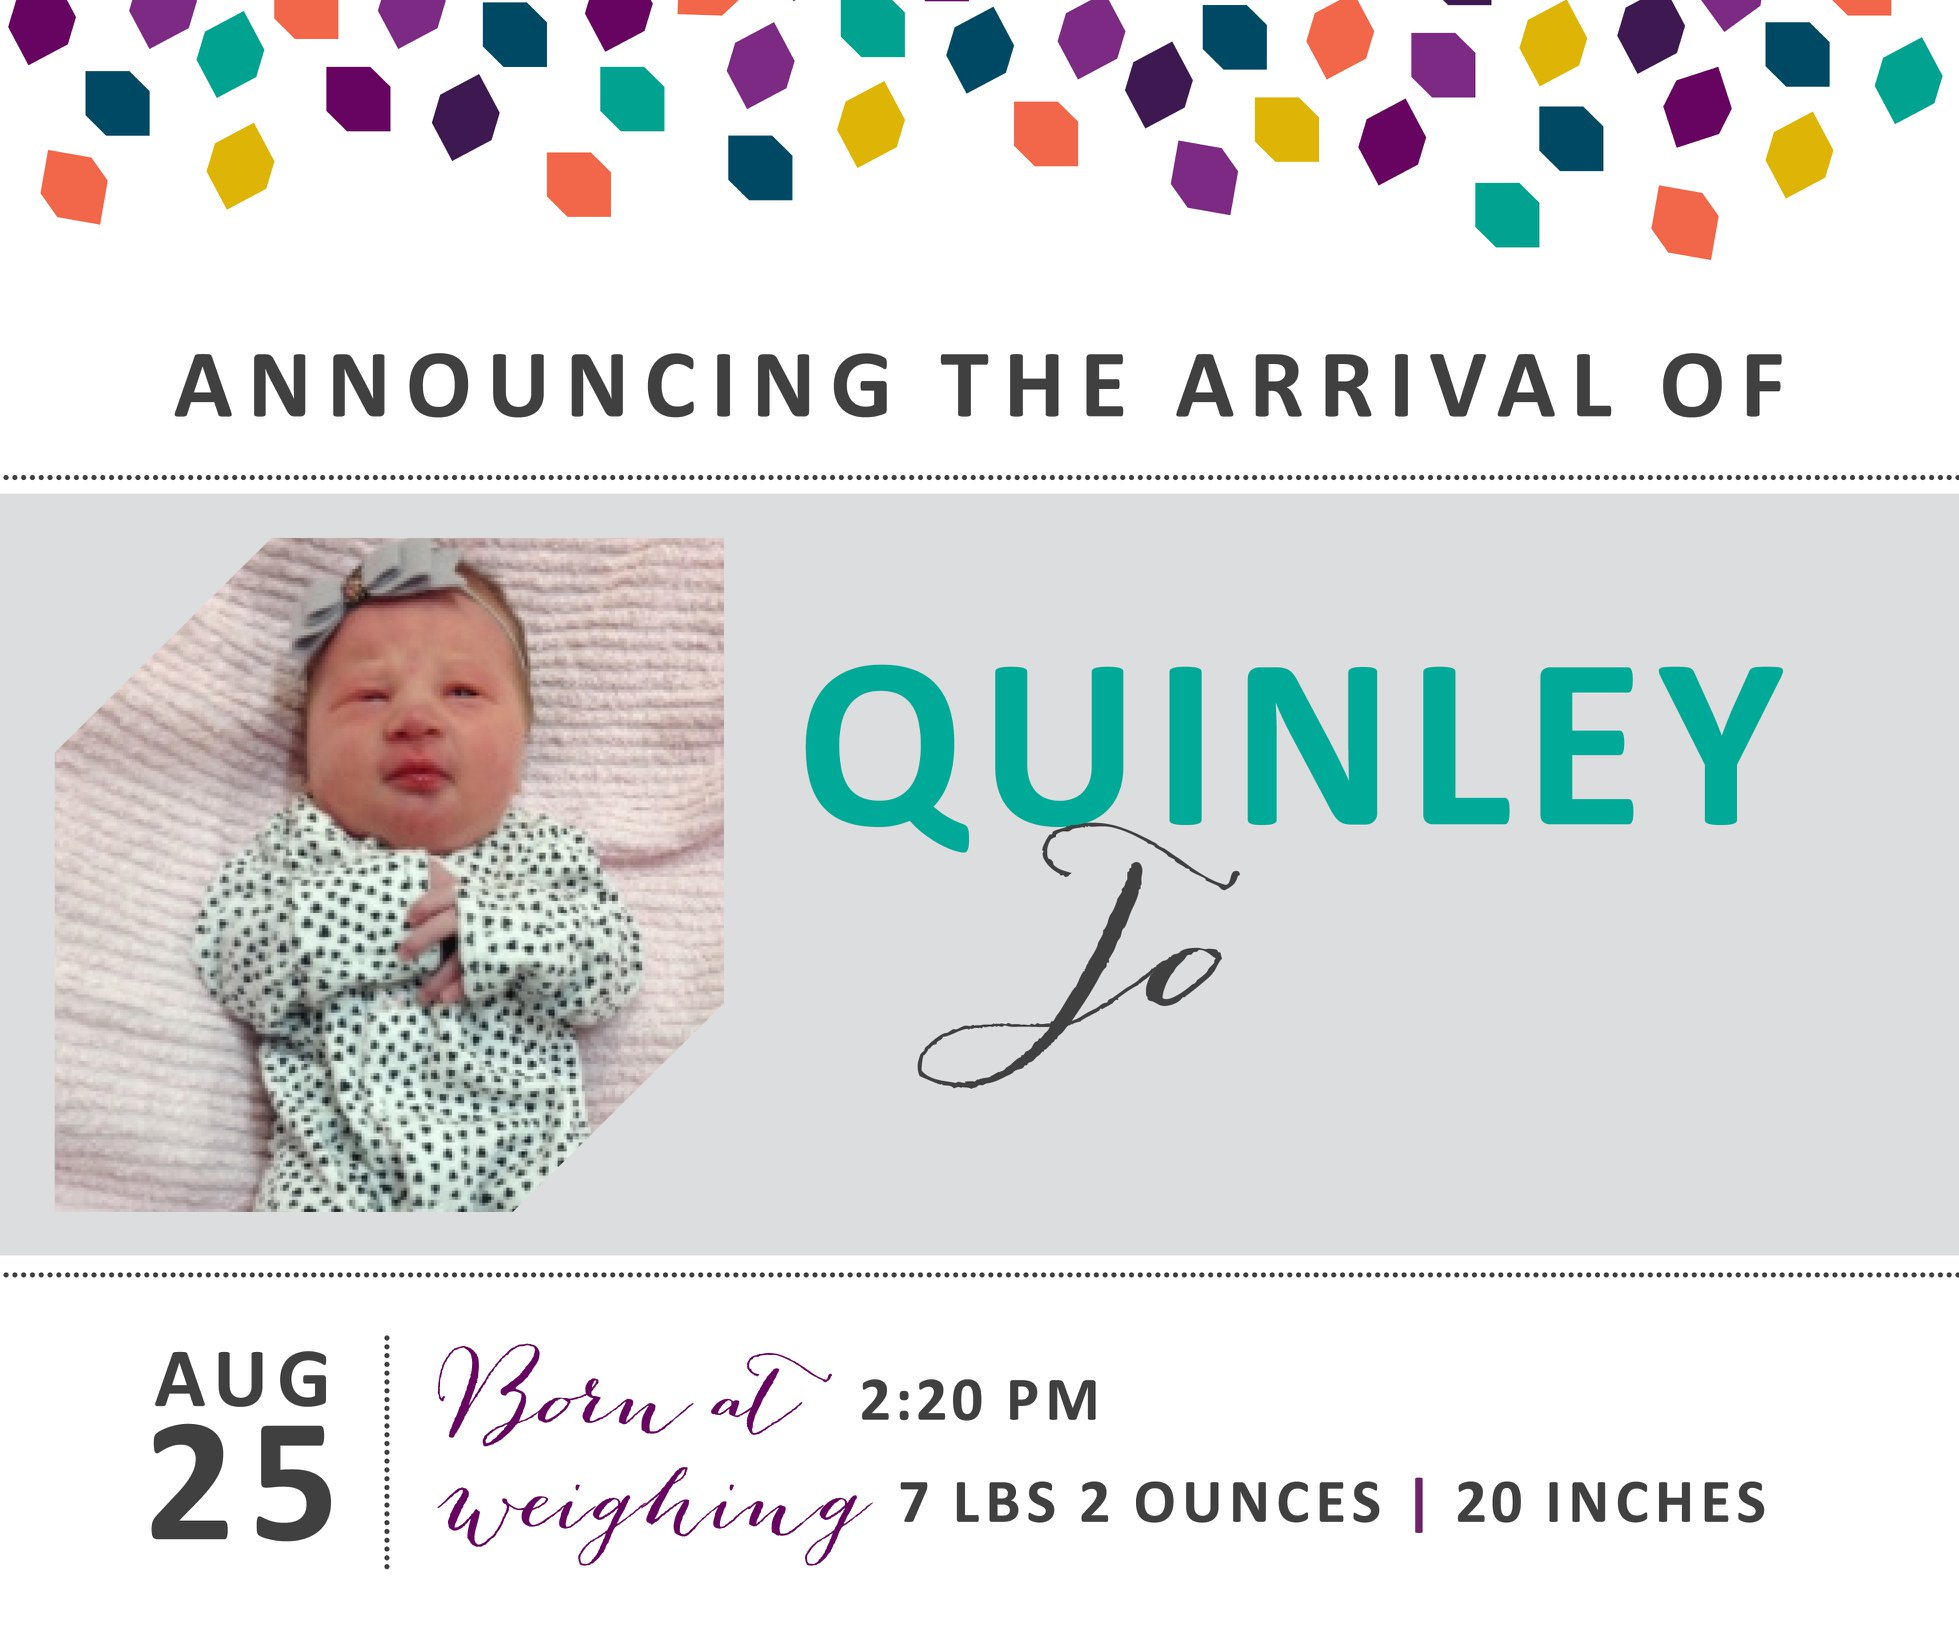 Quinley Jo 1